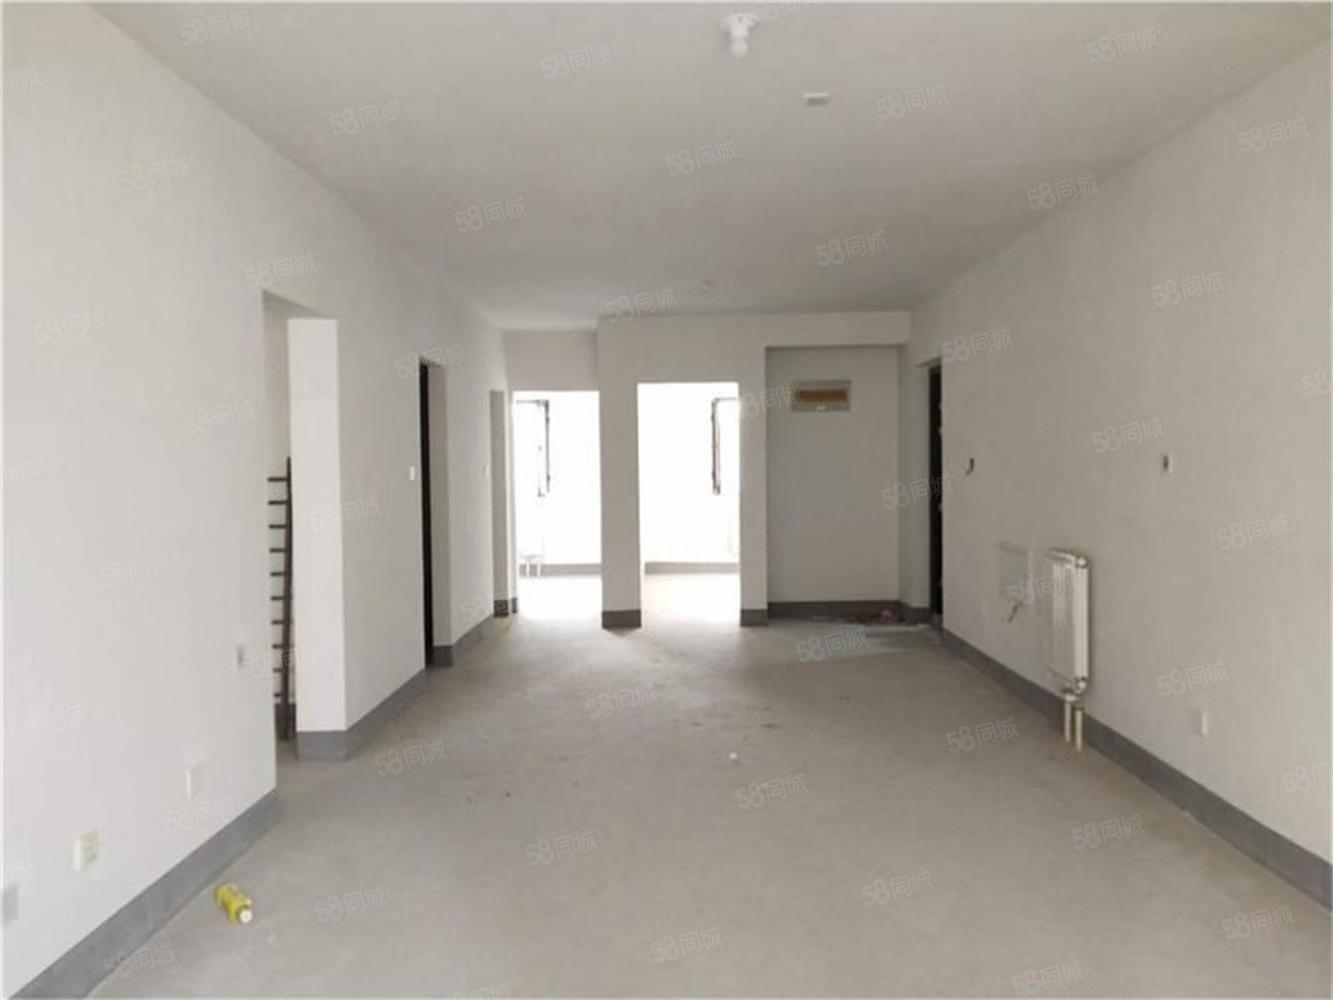 C21優選萬達華府16樓三室兩廳1125平110萬